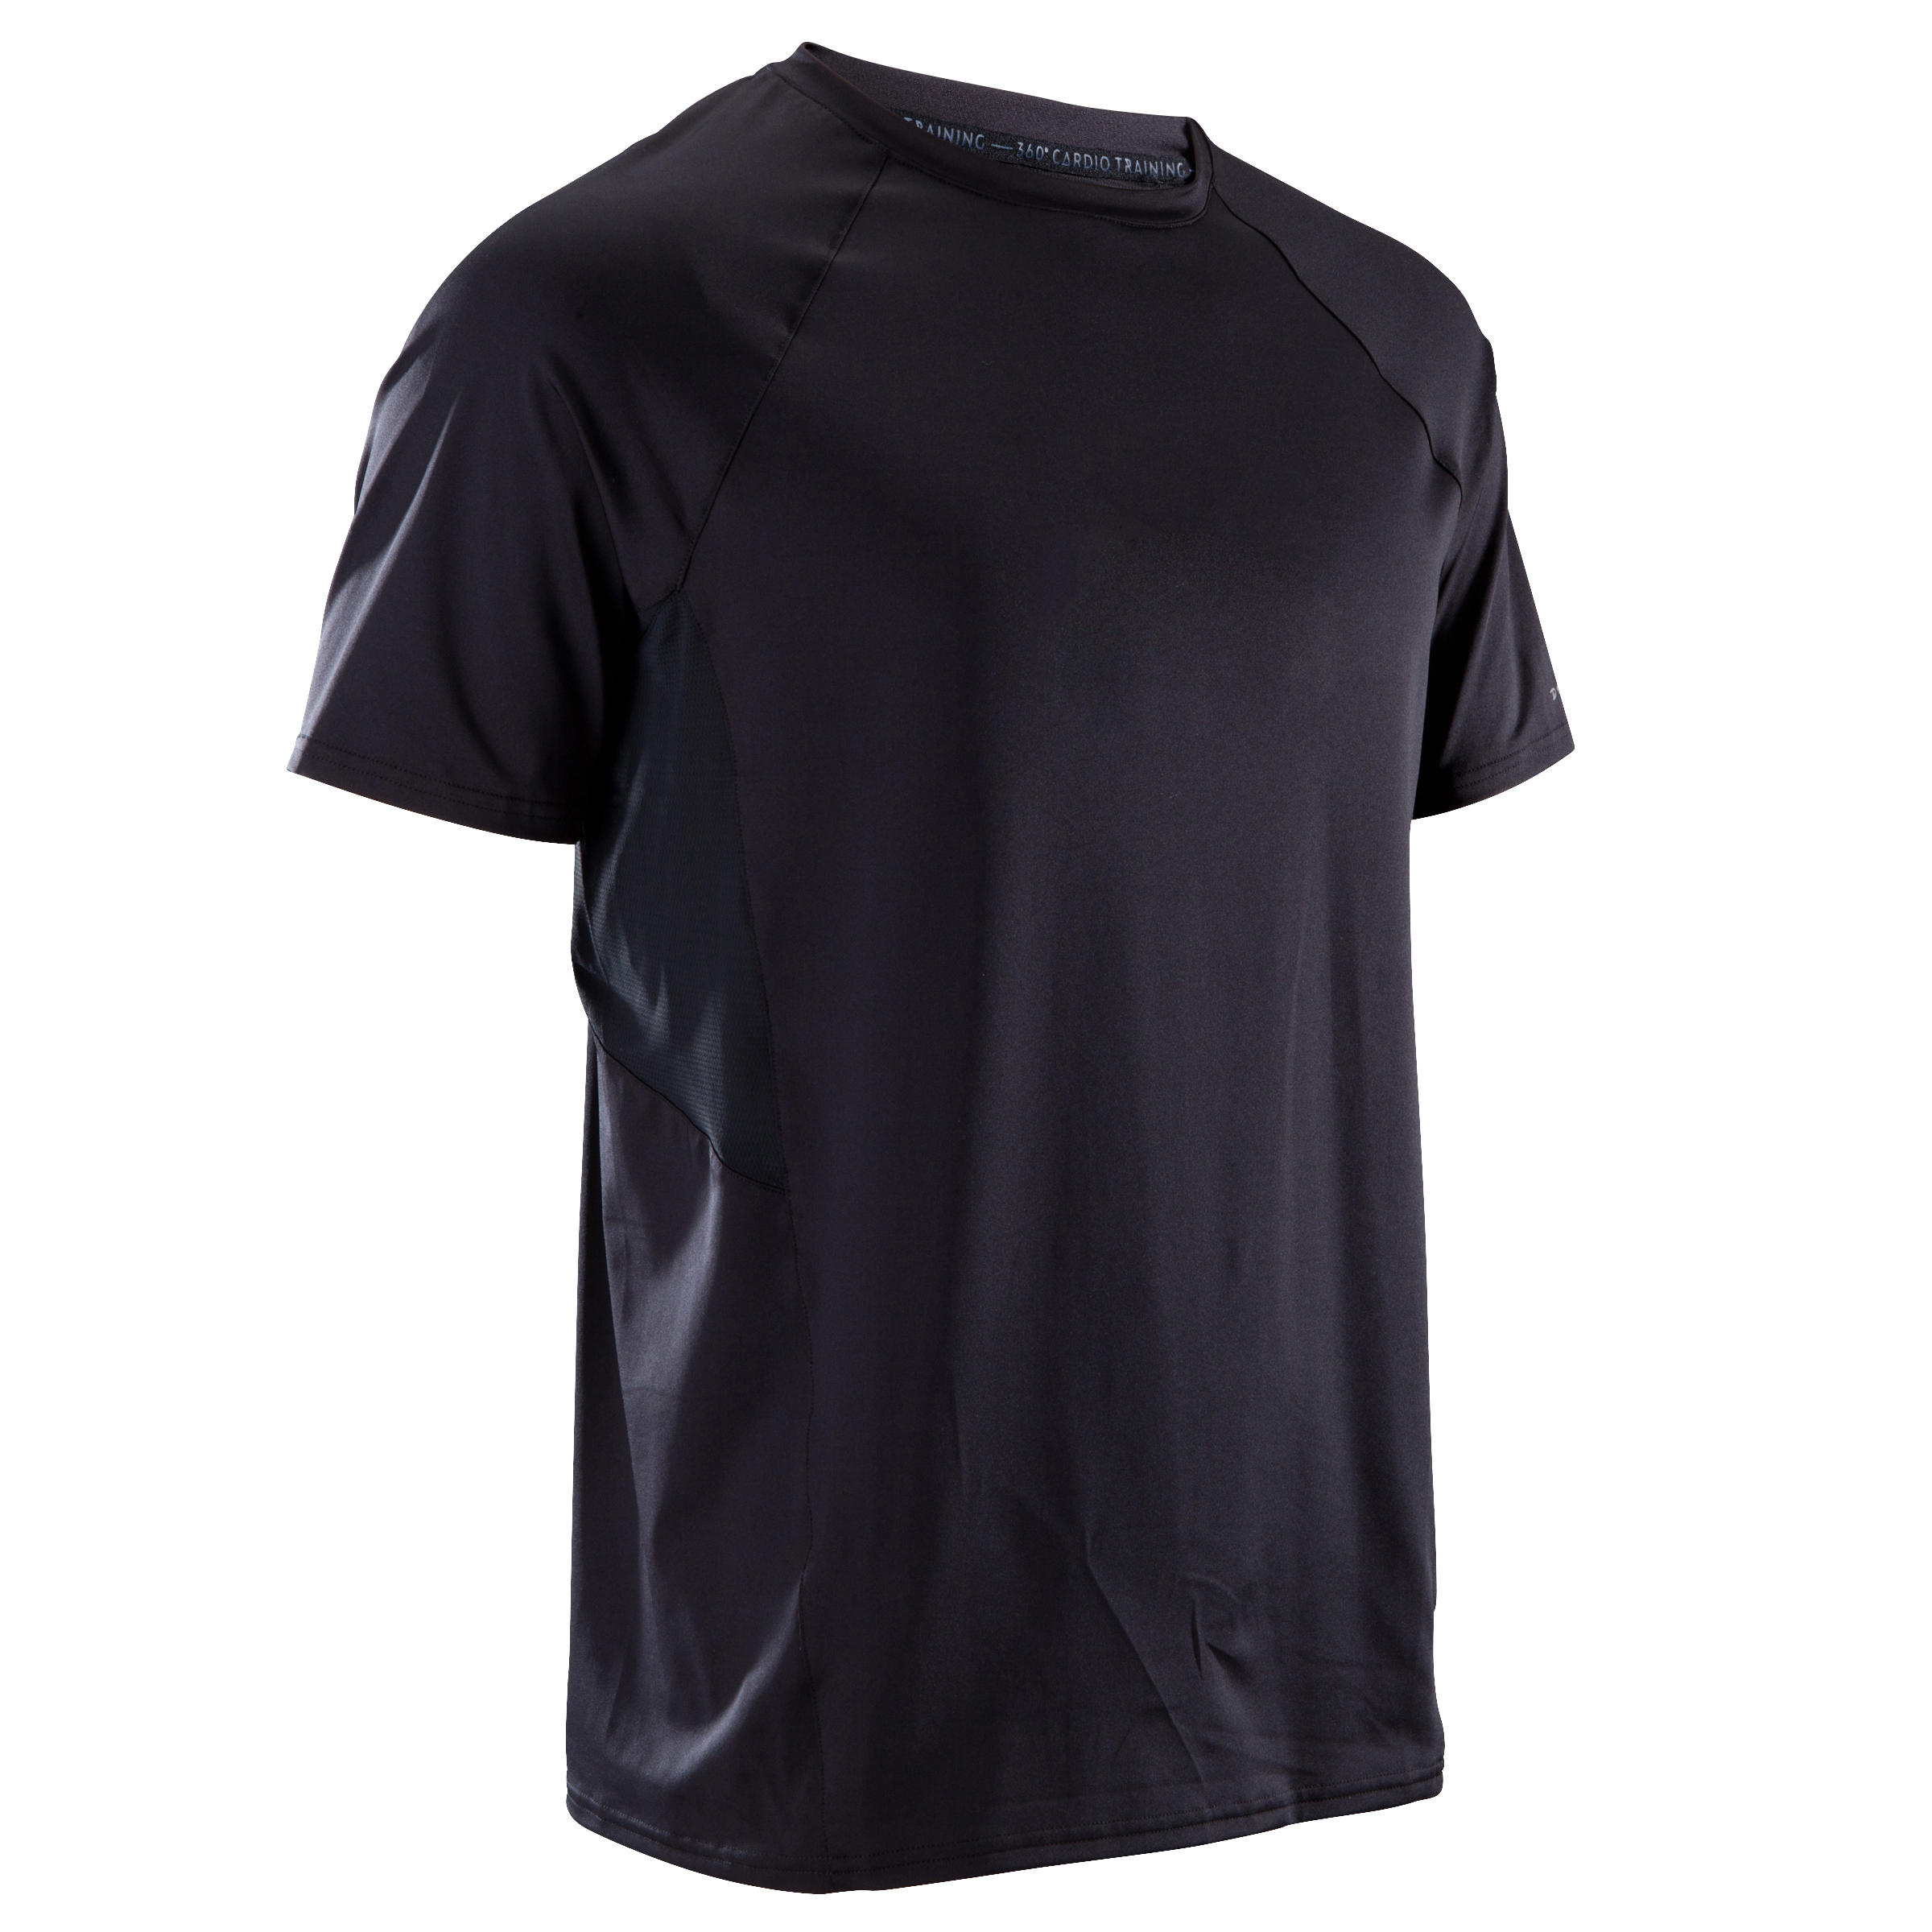 FTS 500 Cardio Fitness T-Shirt - Black